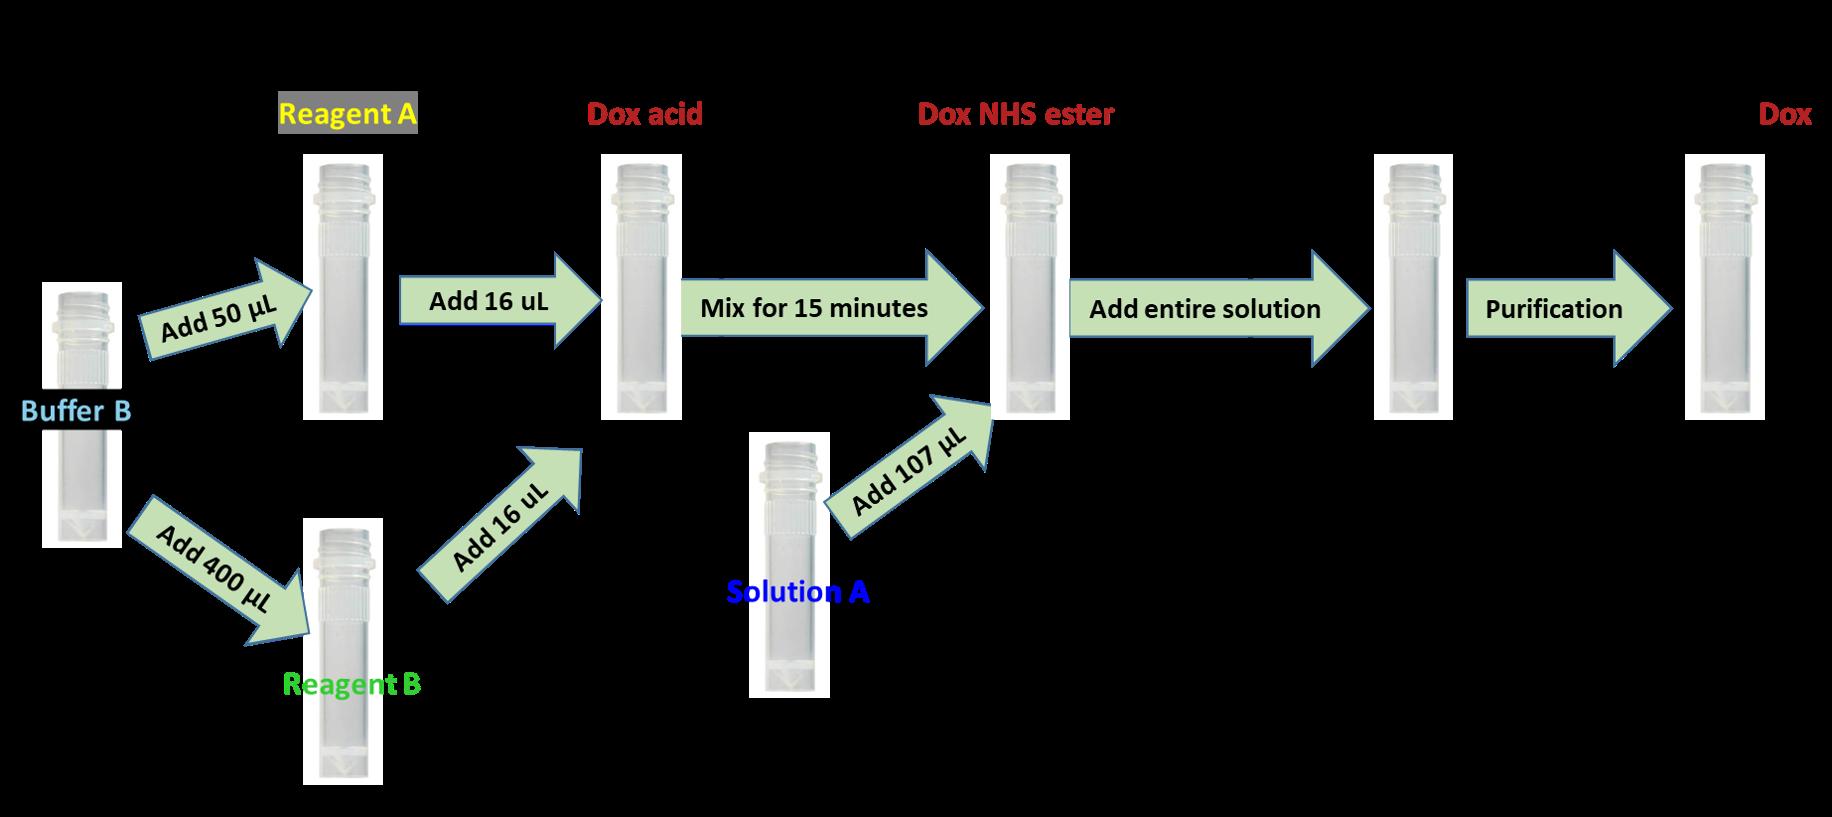 cm11406-antibody-dox-scheme.png